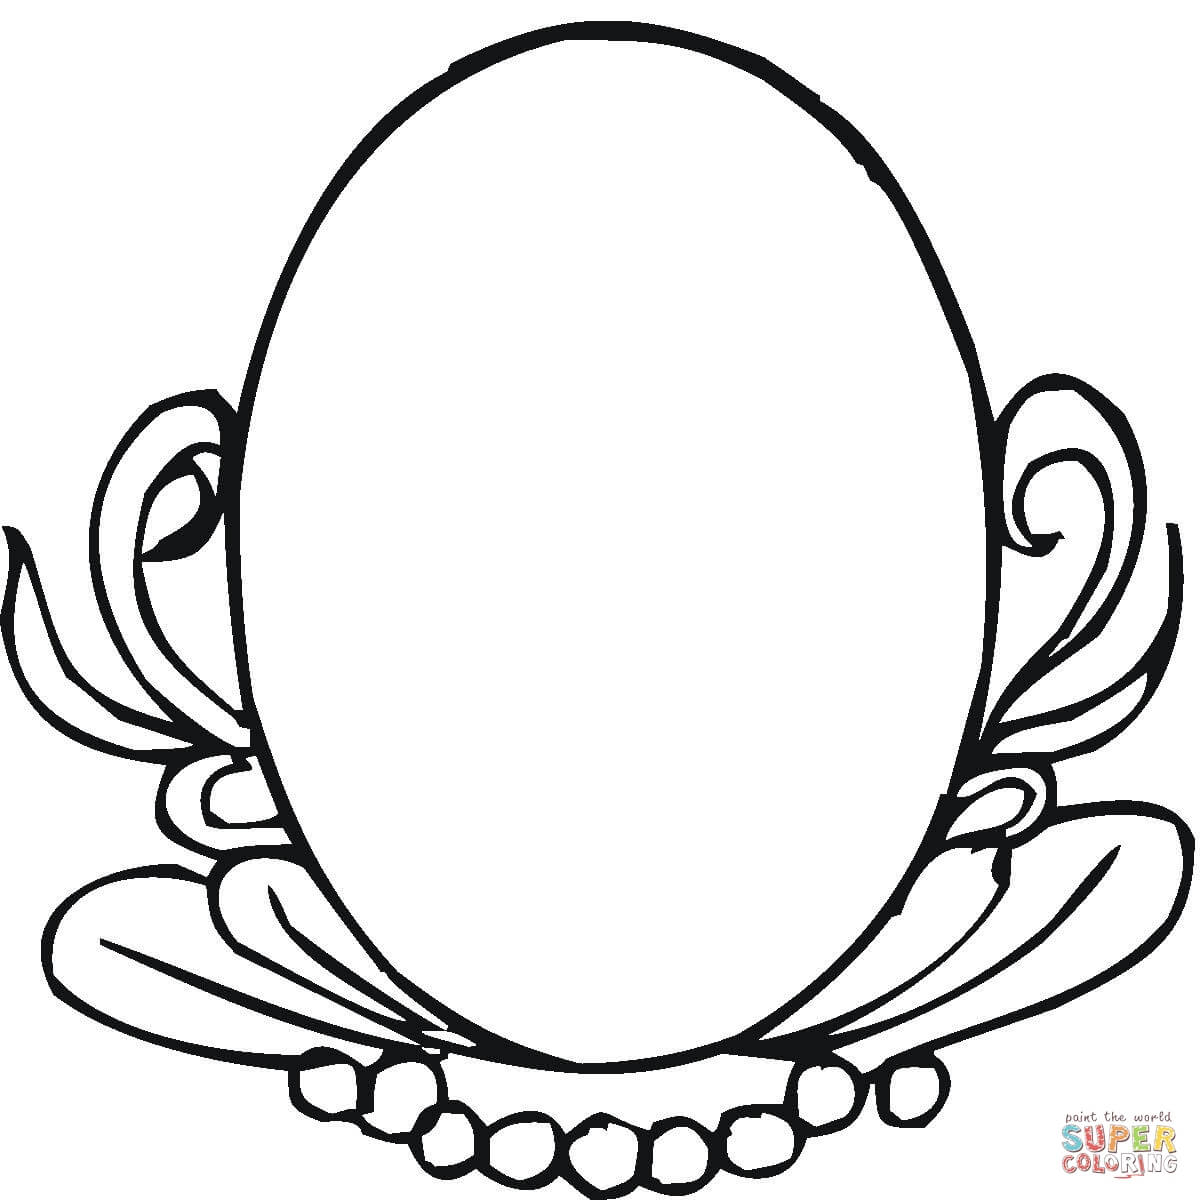 Mirror coloring #8, Download drawings